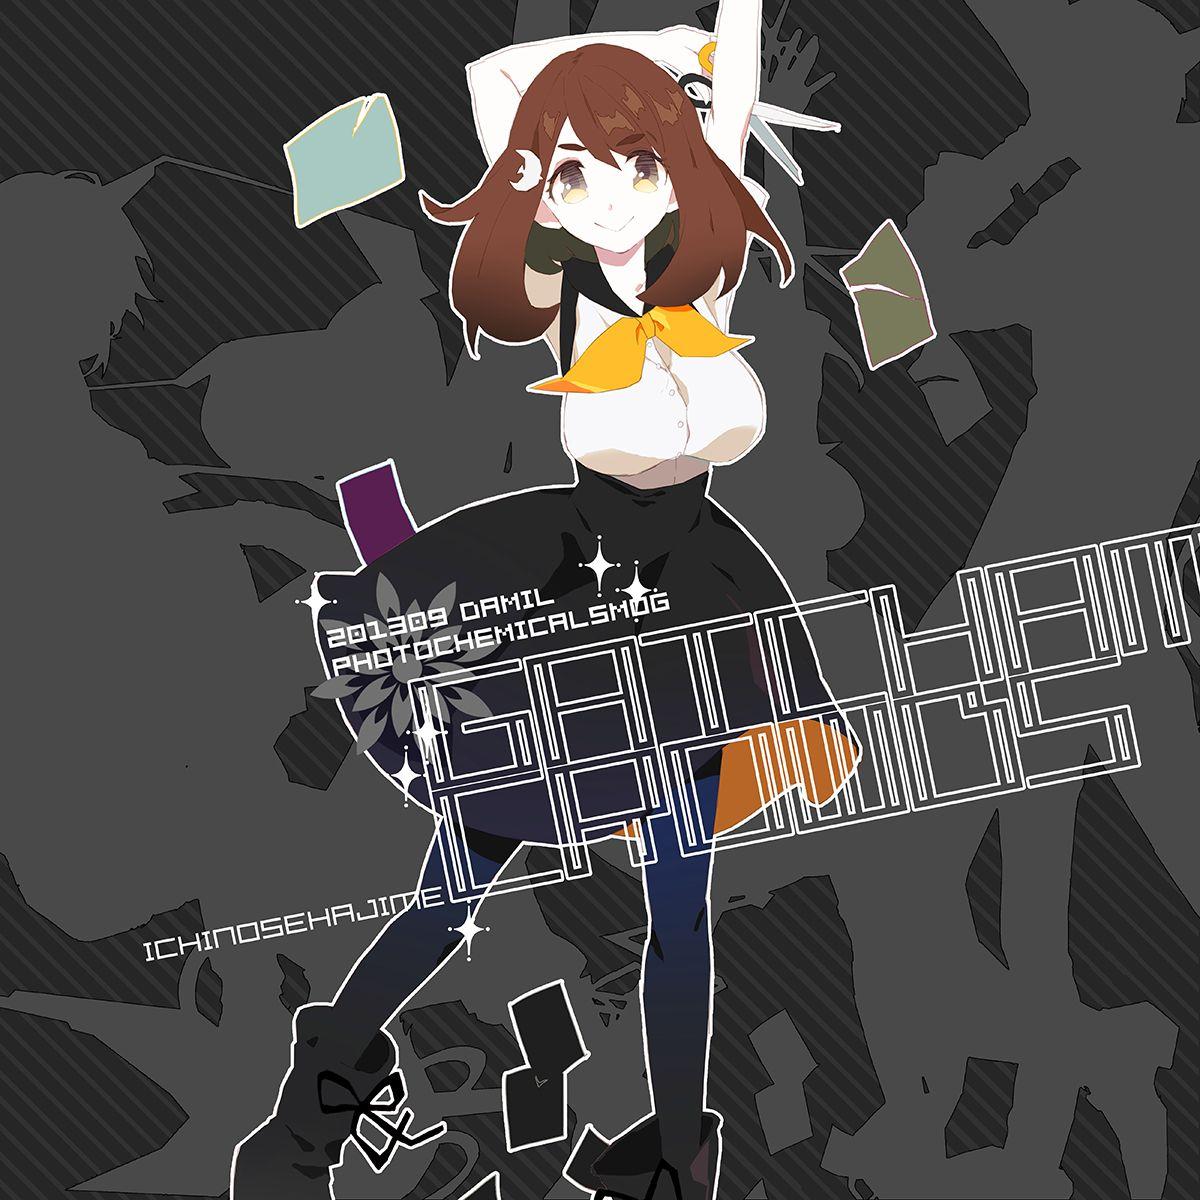 Gatchaman Crowds, Ichinose Hajime (In my top 5 female